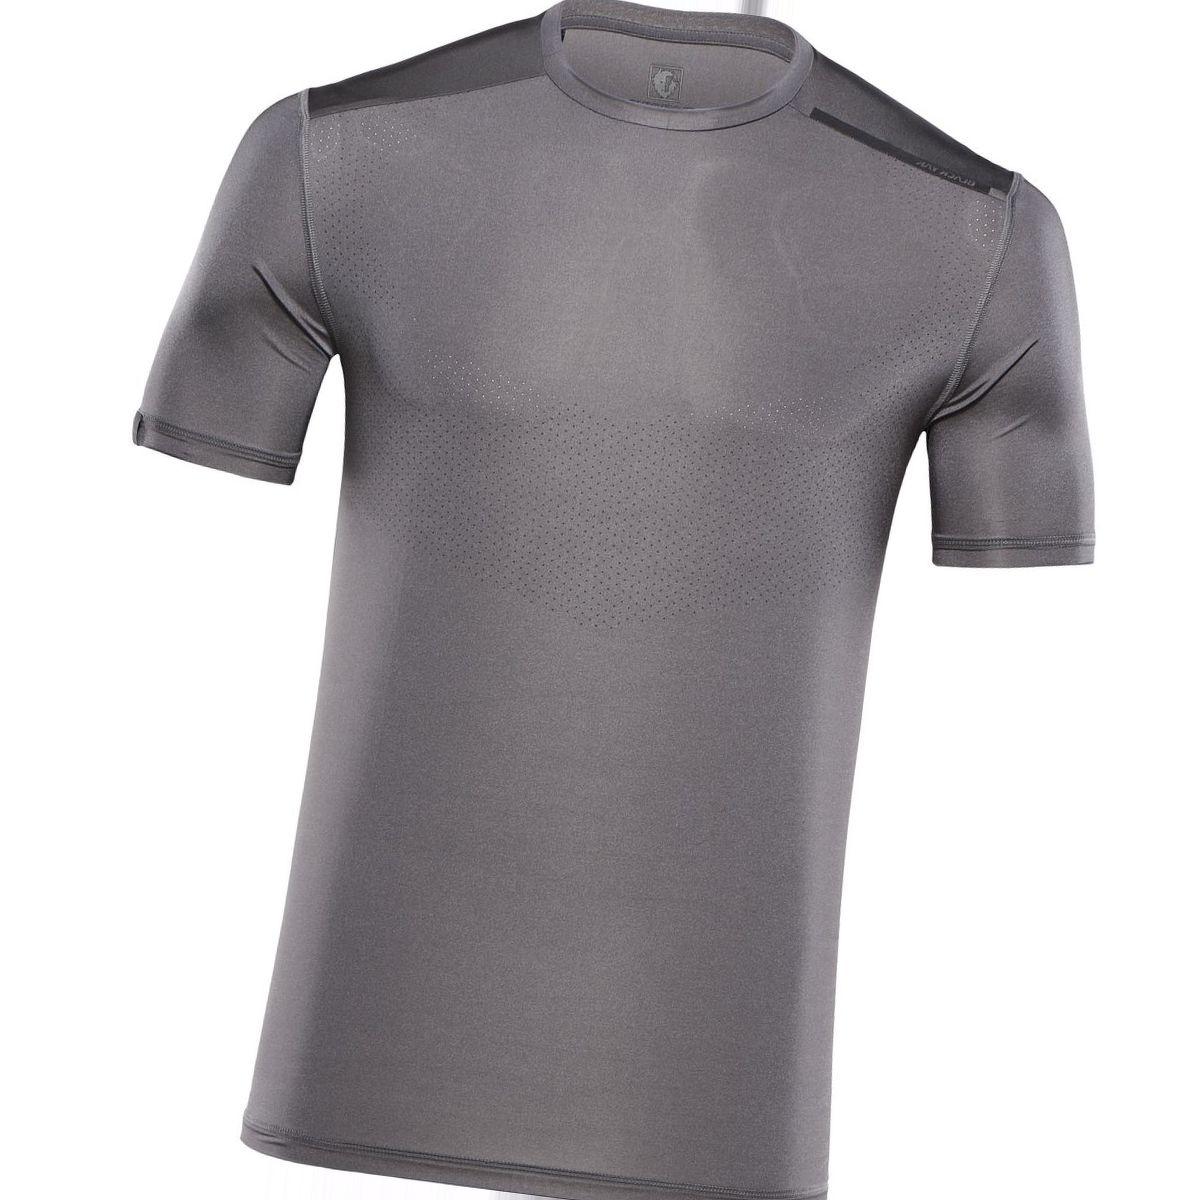 BLACKYAK Sardo Shirt - Men's